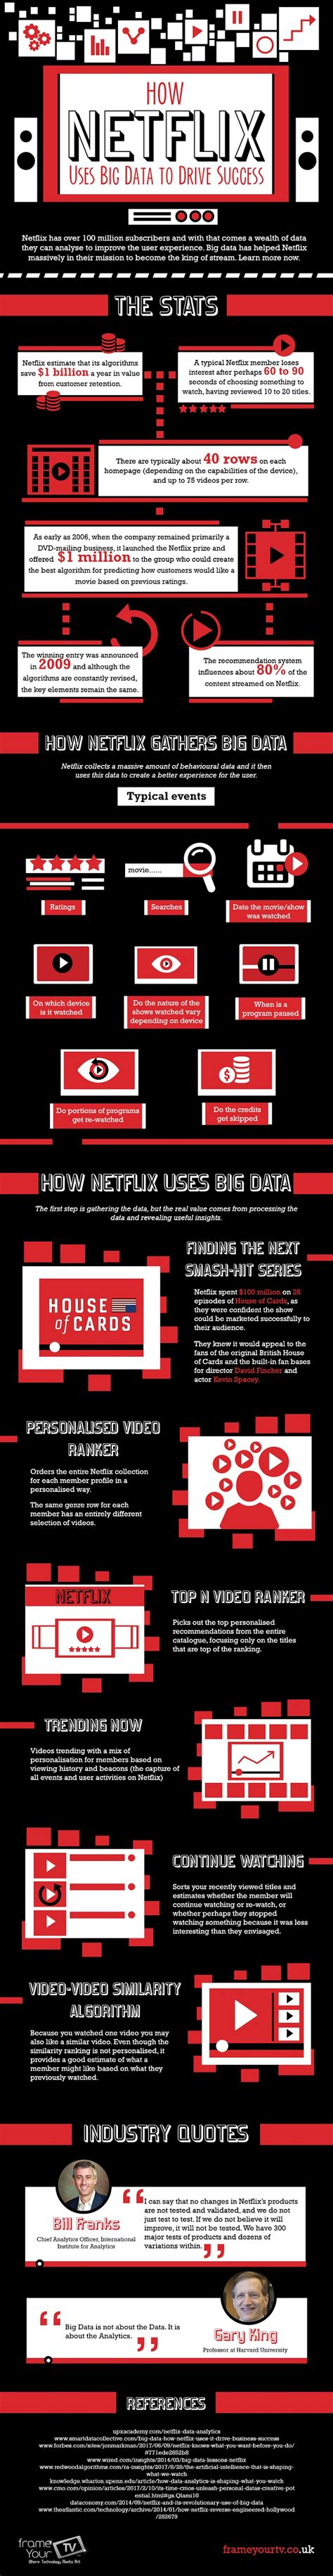 drive netflix how netflix uses big data to drive success insidebigdata